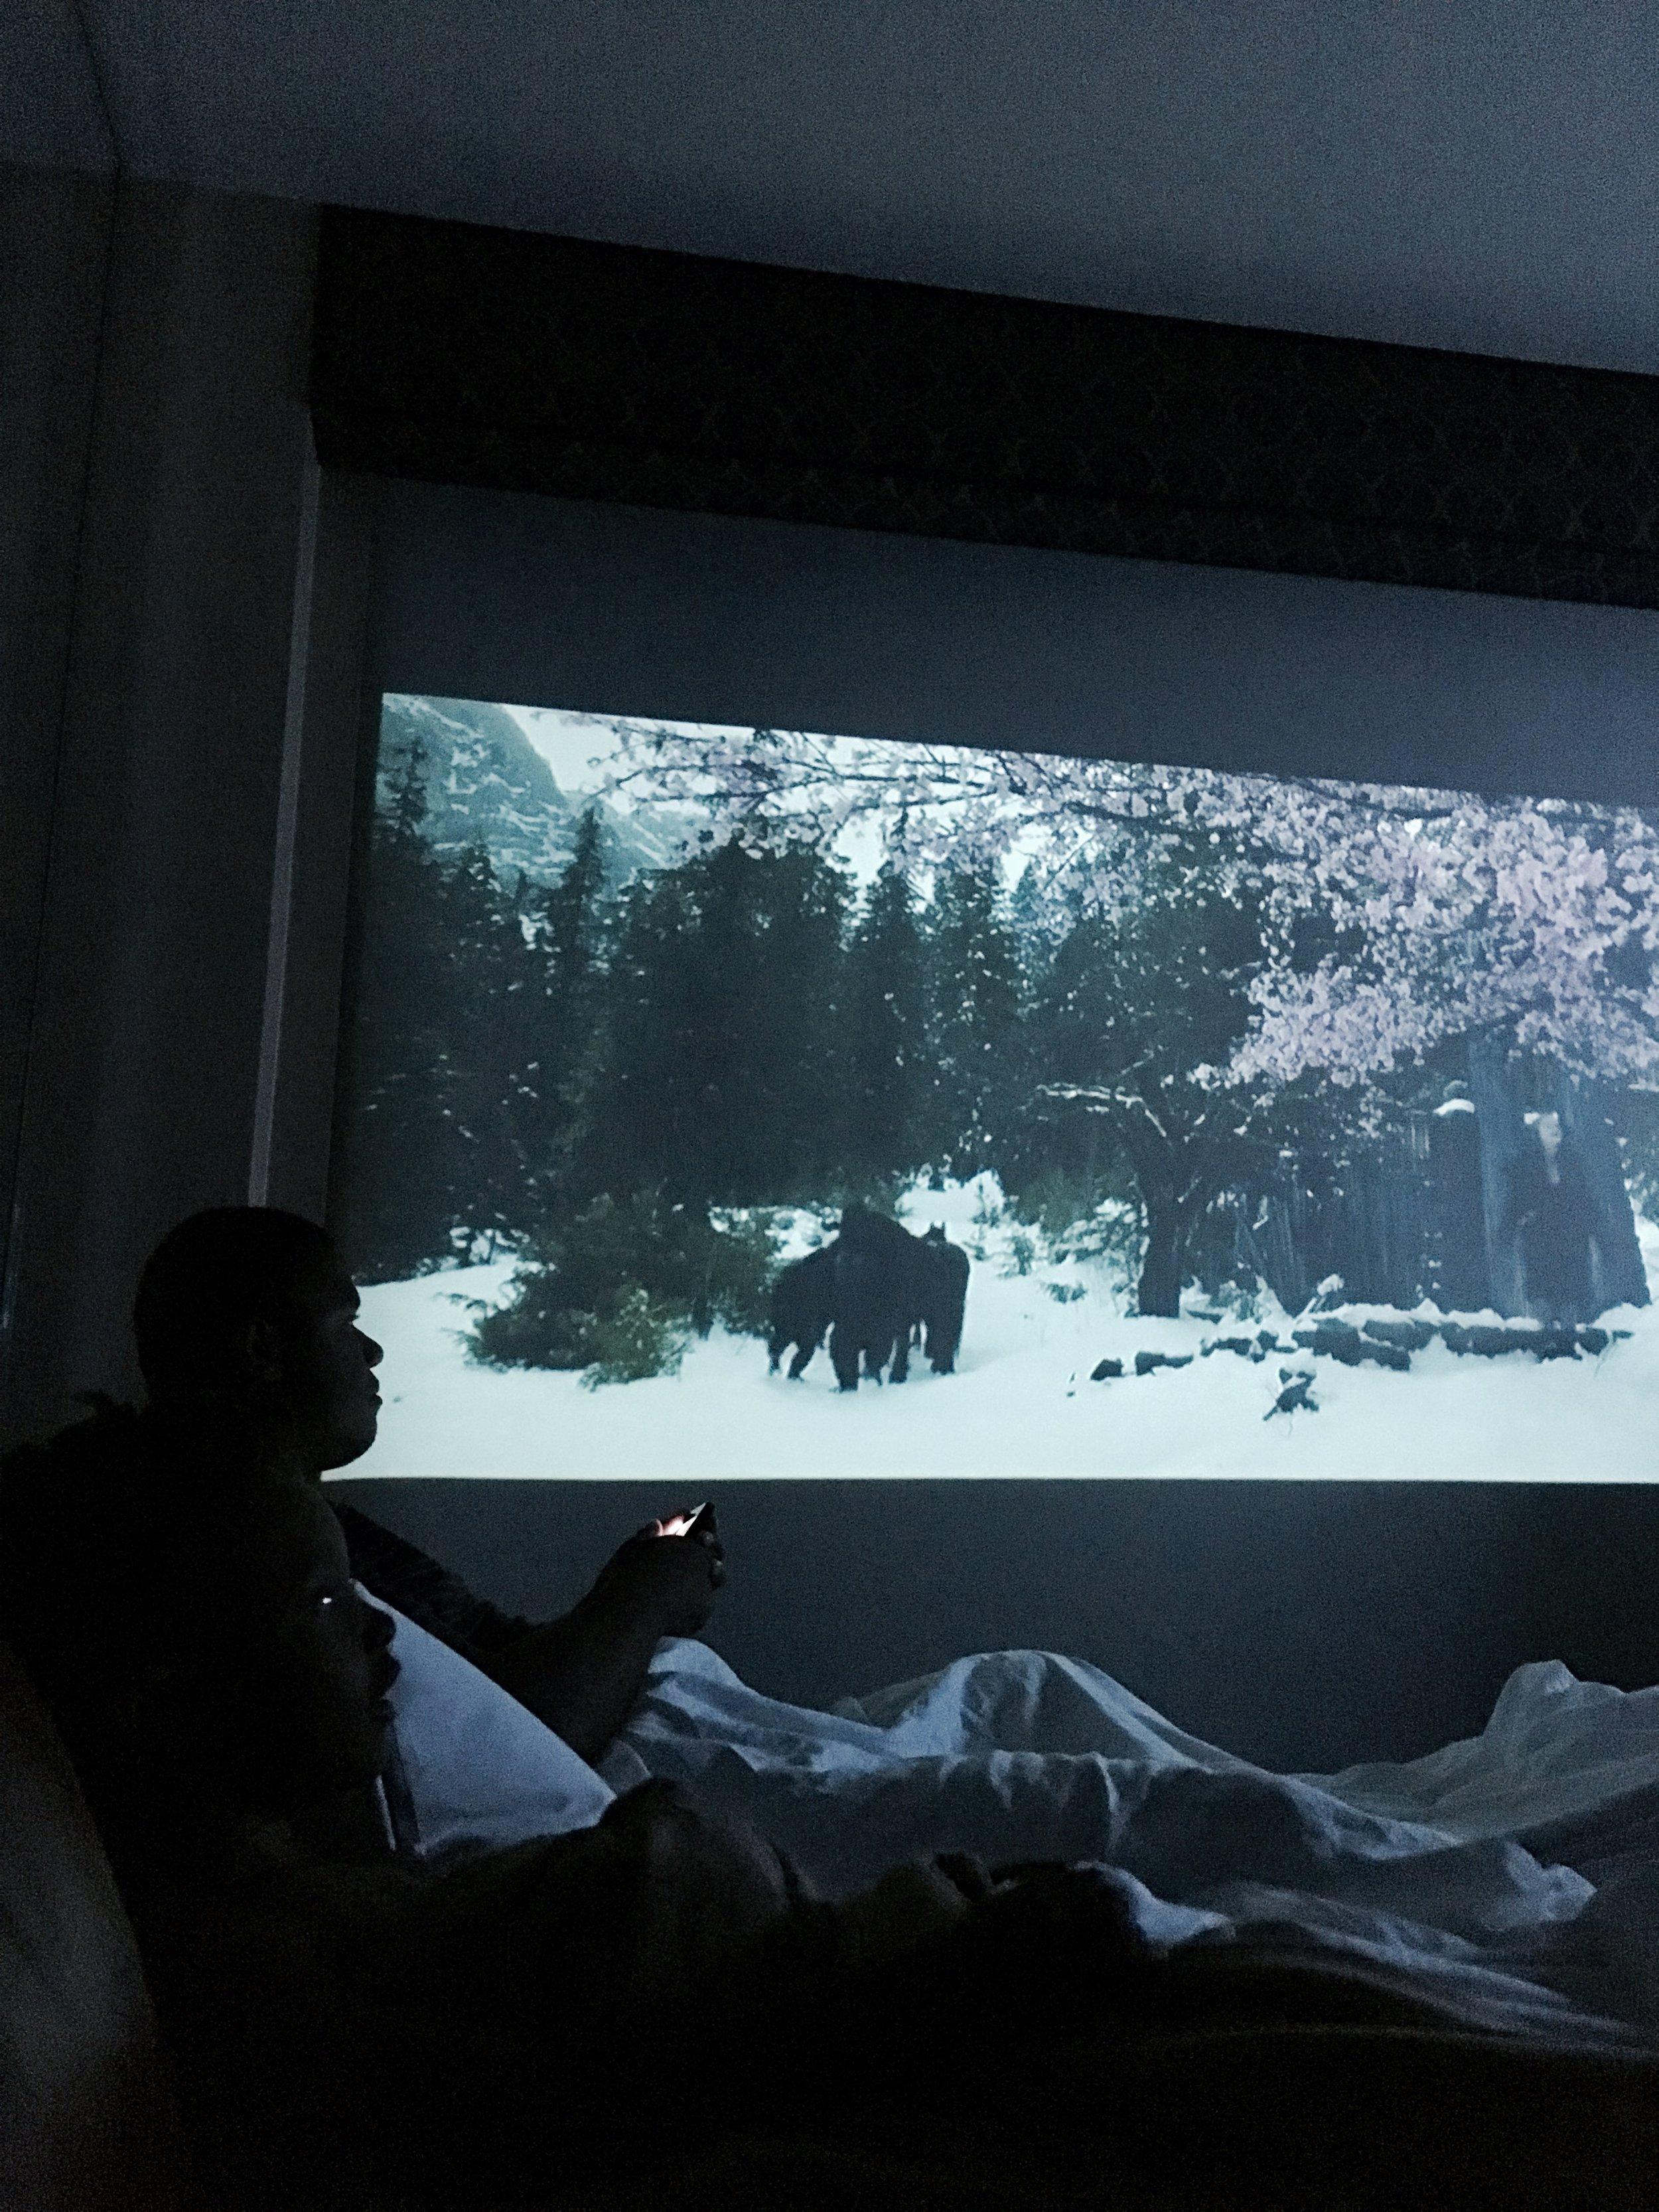 Had to take advantage of the projector in the condo!